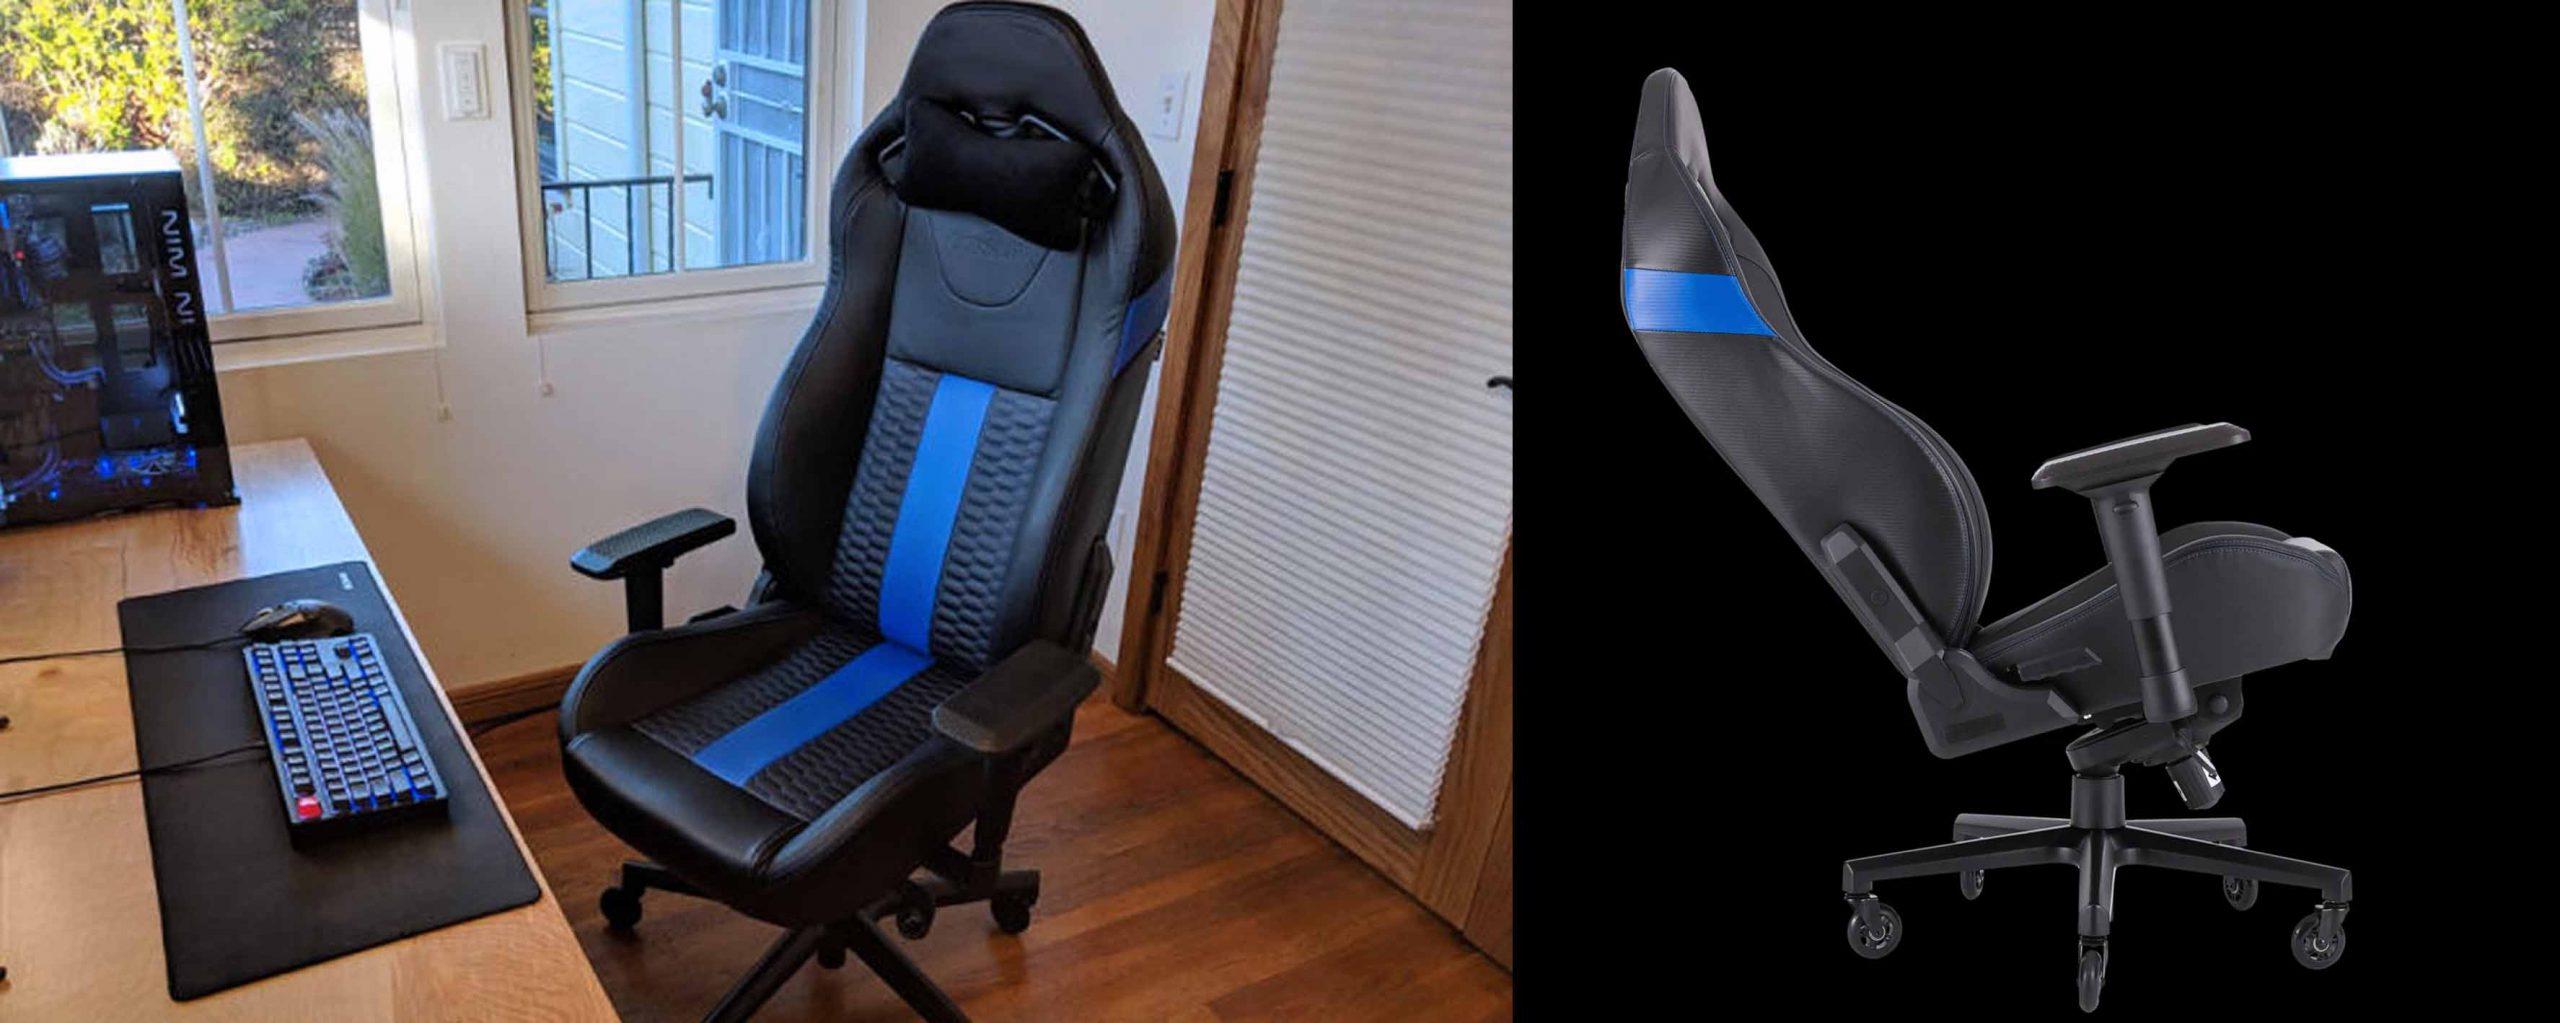 gaming chairs  - صندلی های بازی - تاریخچه-و-کاربرد-صندلی-های-گیمینگ---صندلی-گیمینگ---صندلی-بازی---Corsair-T2-Road-Warrior---gaming-chair---1 - Corsair T2 Road Warrior